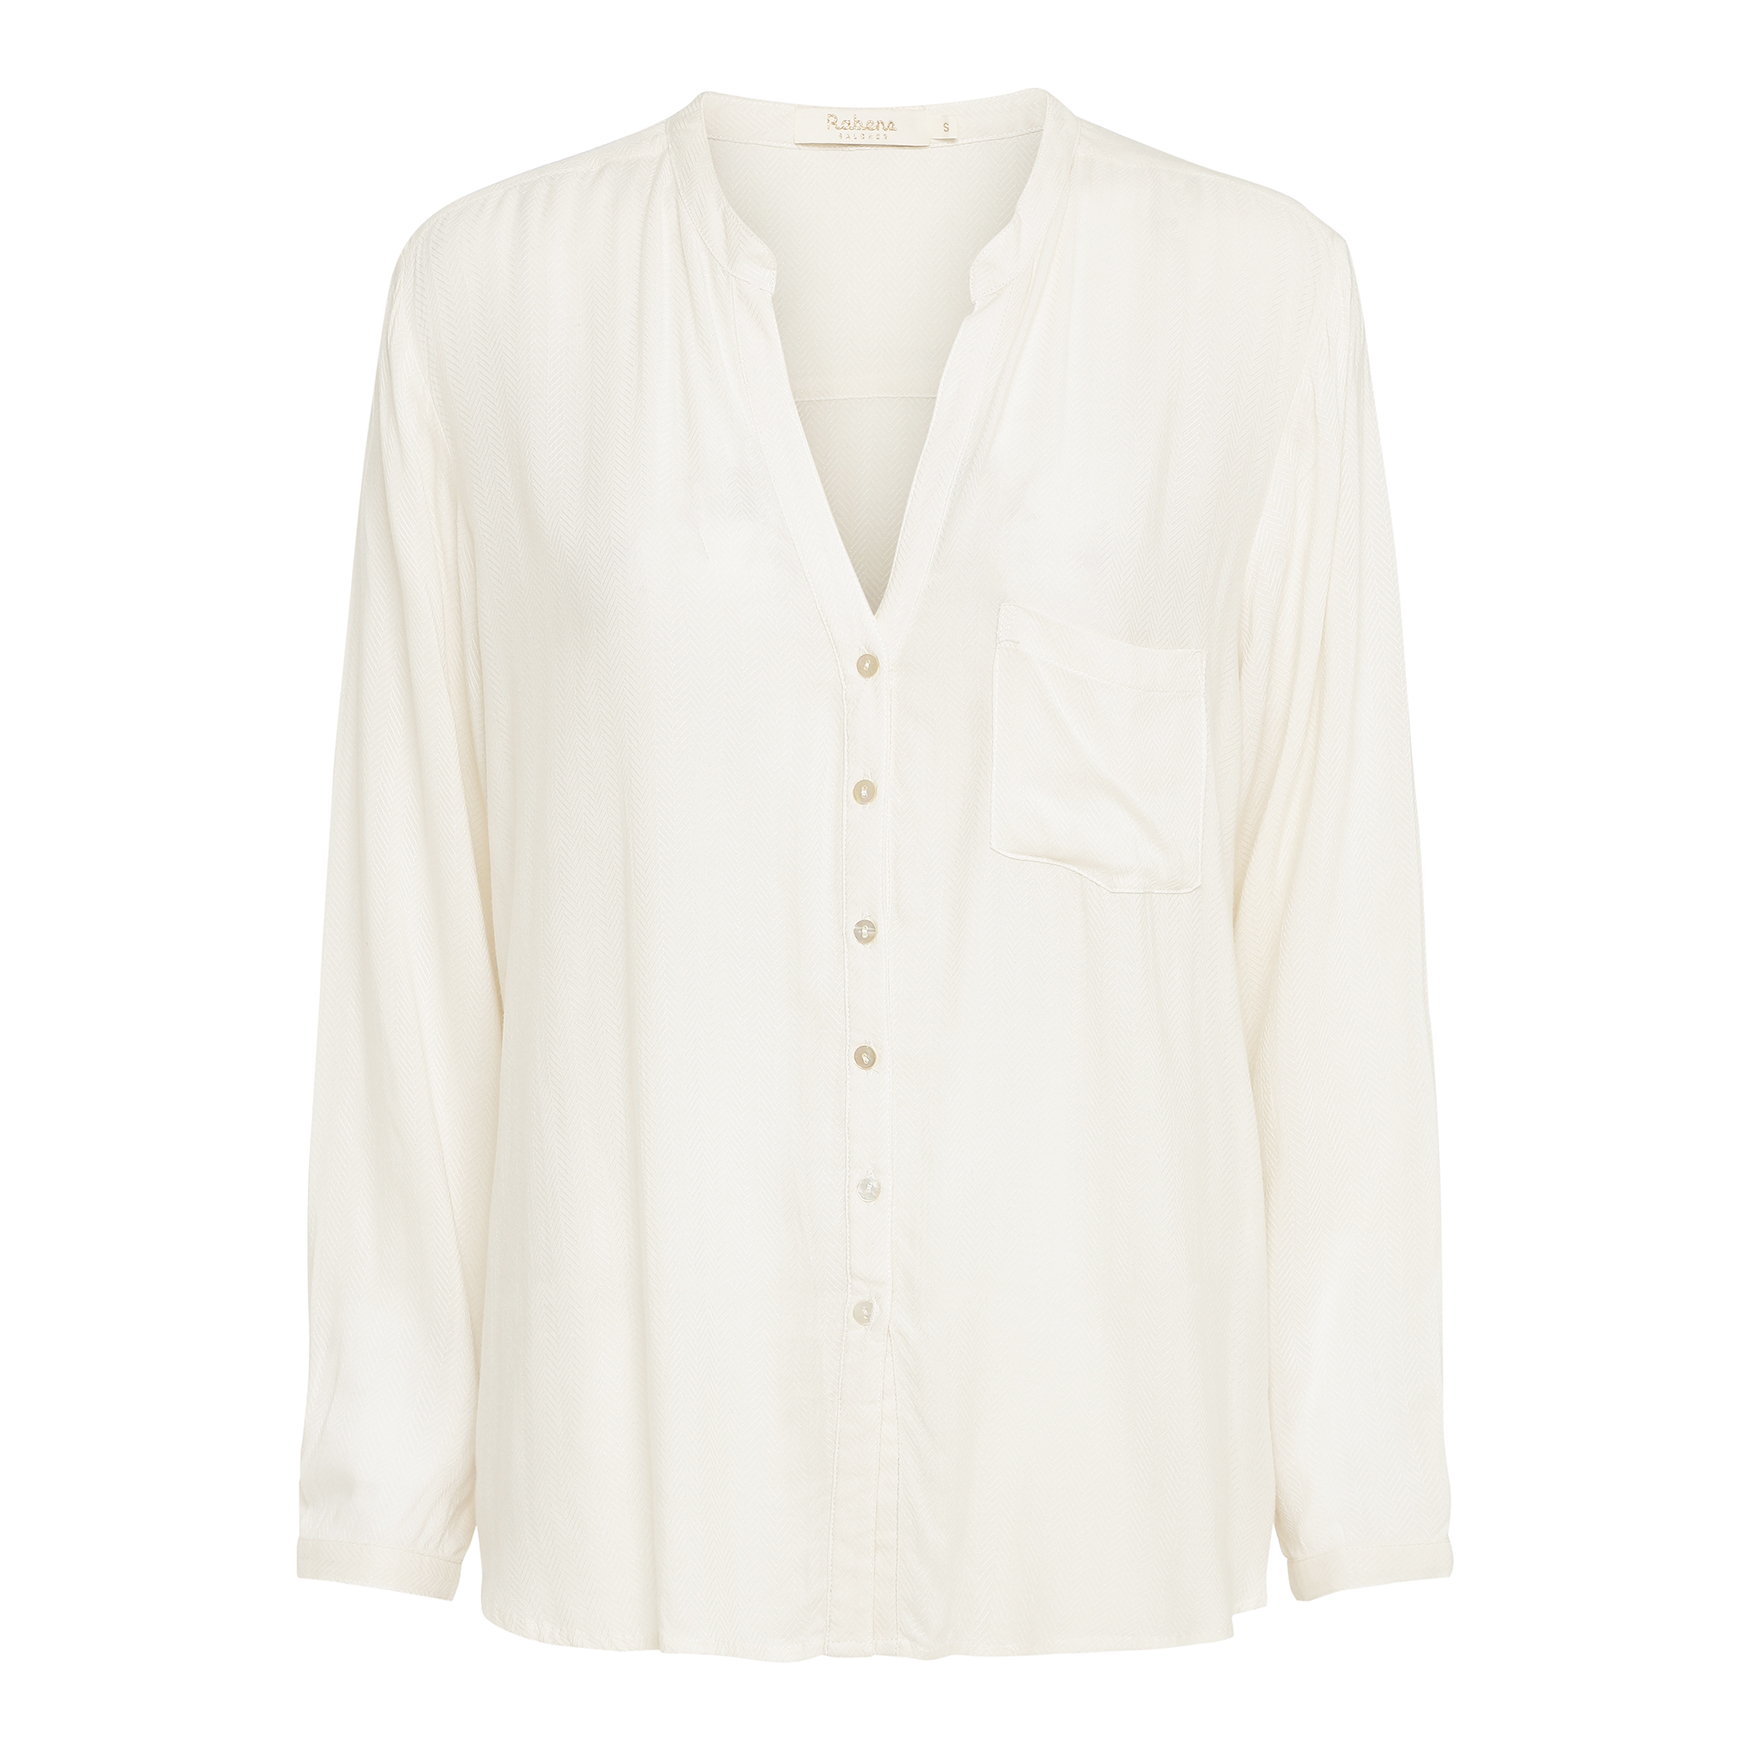 Rabens Saloner  Dara Shirt in Milk White